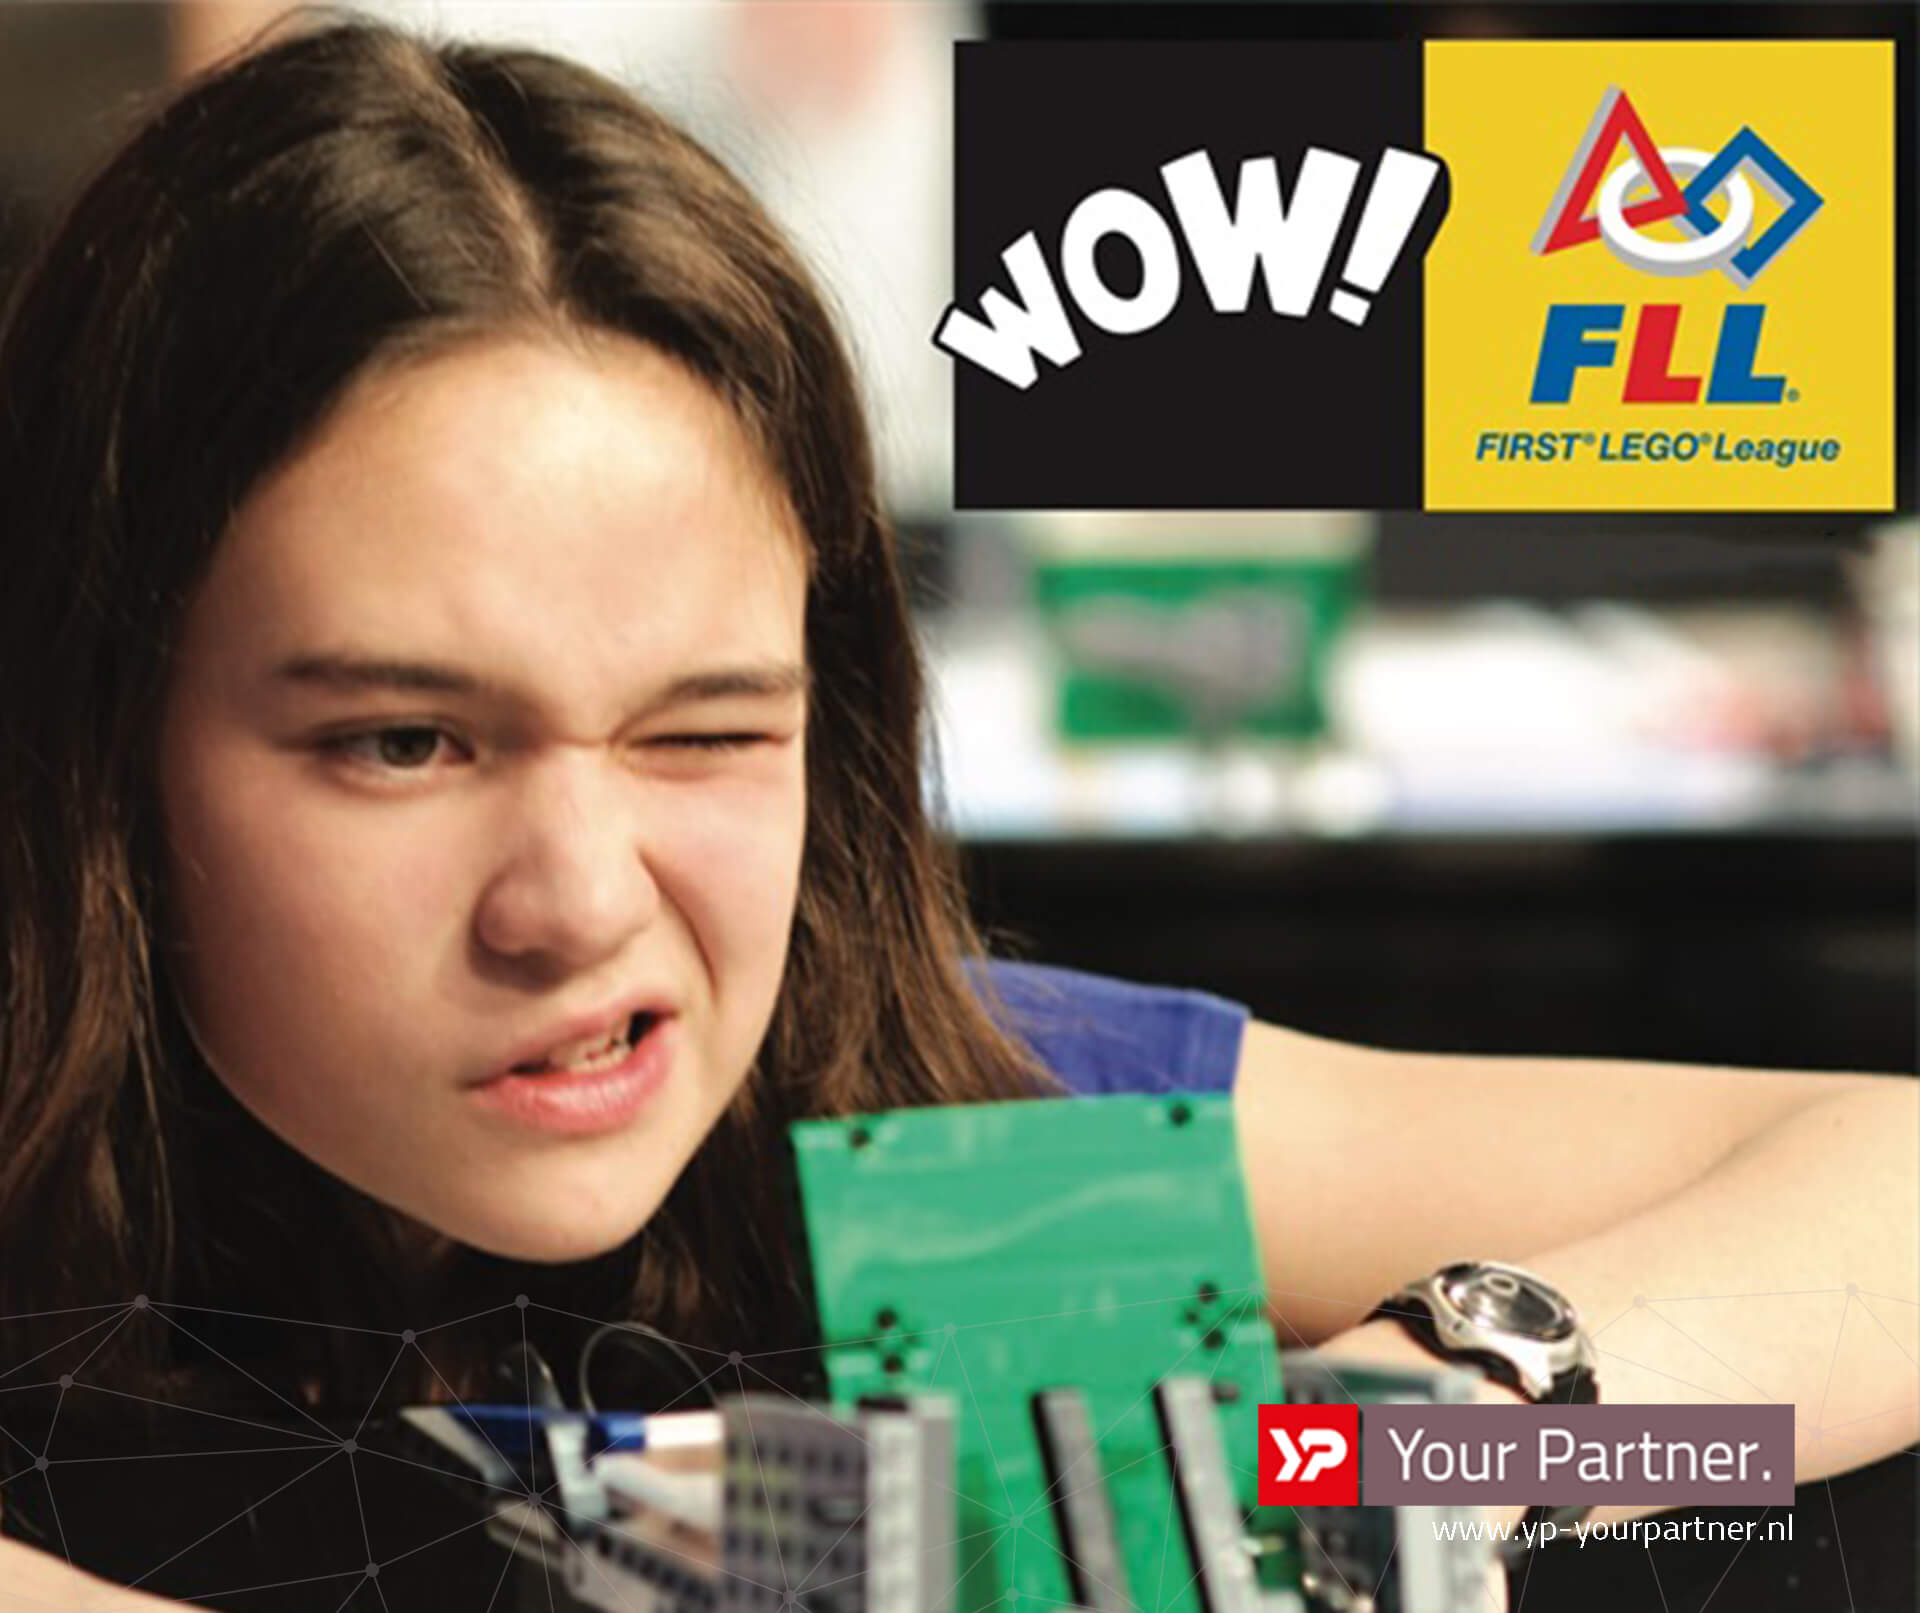 YP Your Partner partner first lego league - innovatiecluster drachten